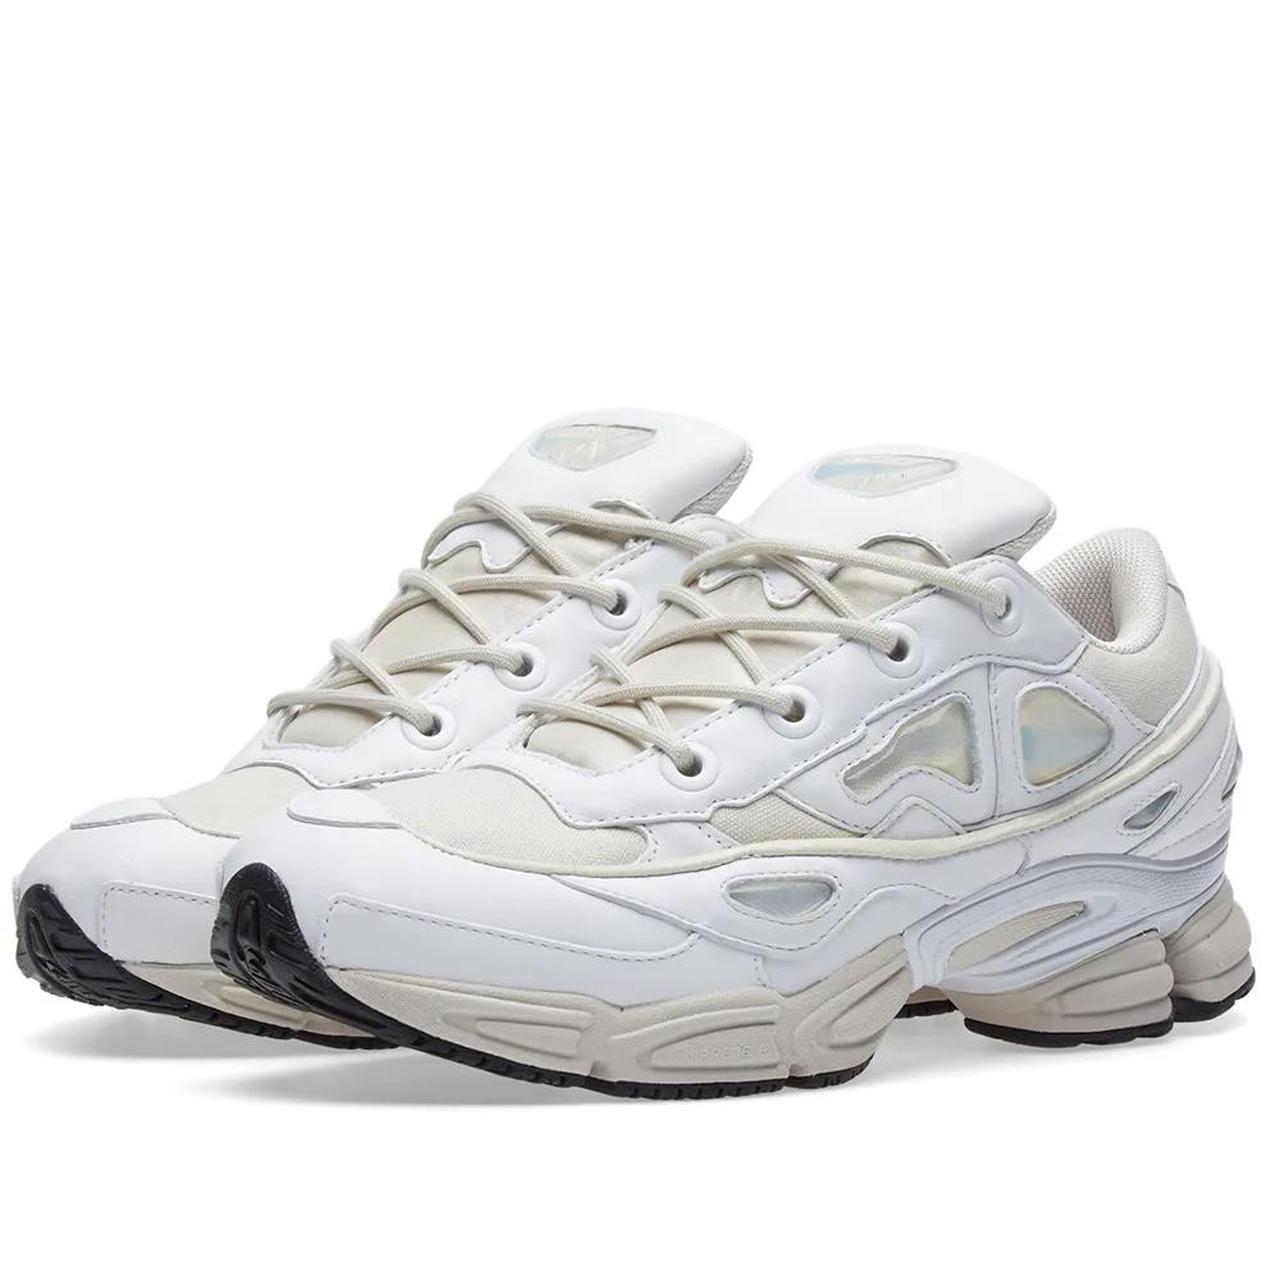 Product Image 1 - Adidas x RAF SIMONS Ozweego